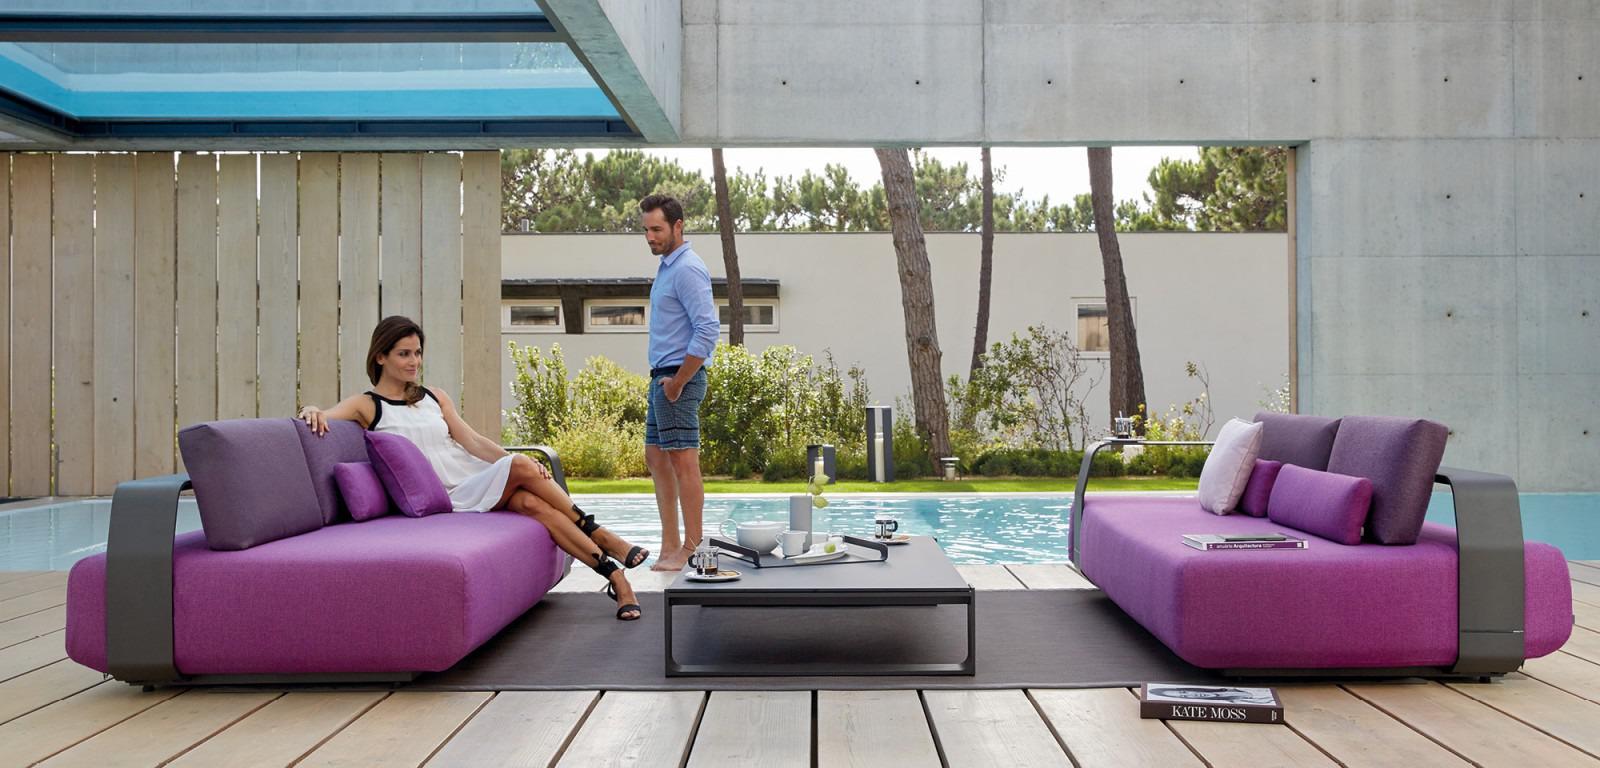 Manutti Luxury Kumo 3 Seater Sofa - Couture Outdoor